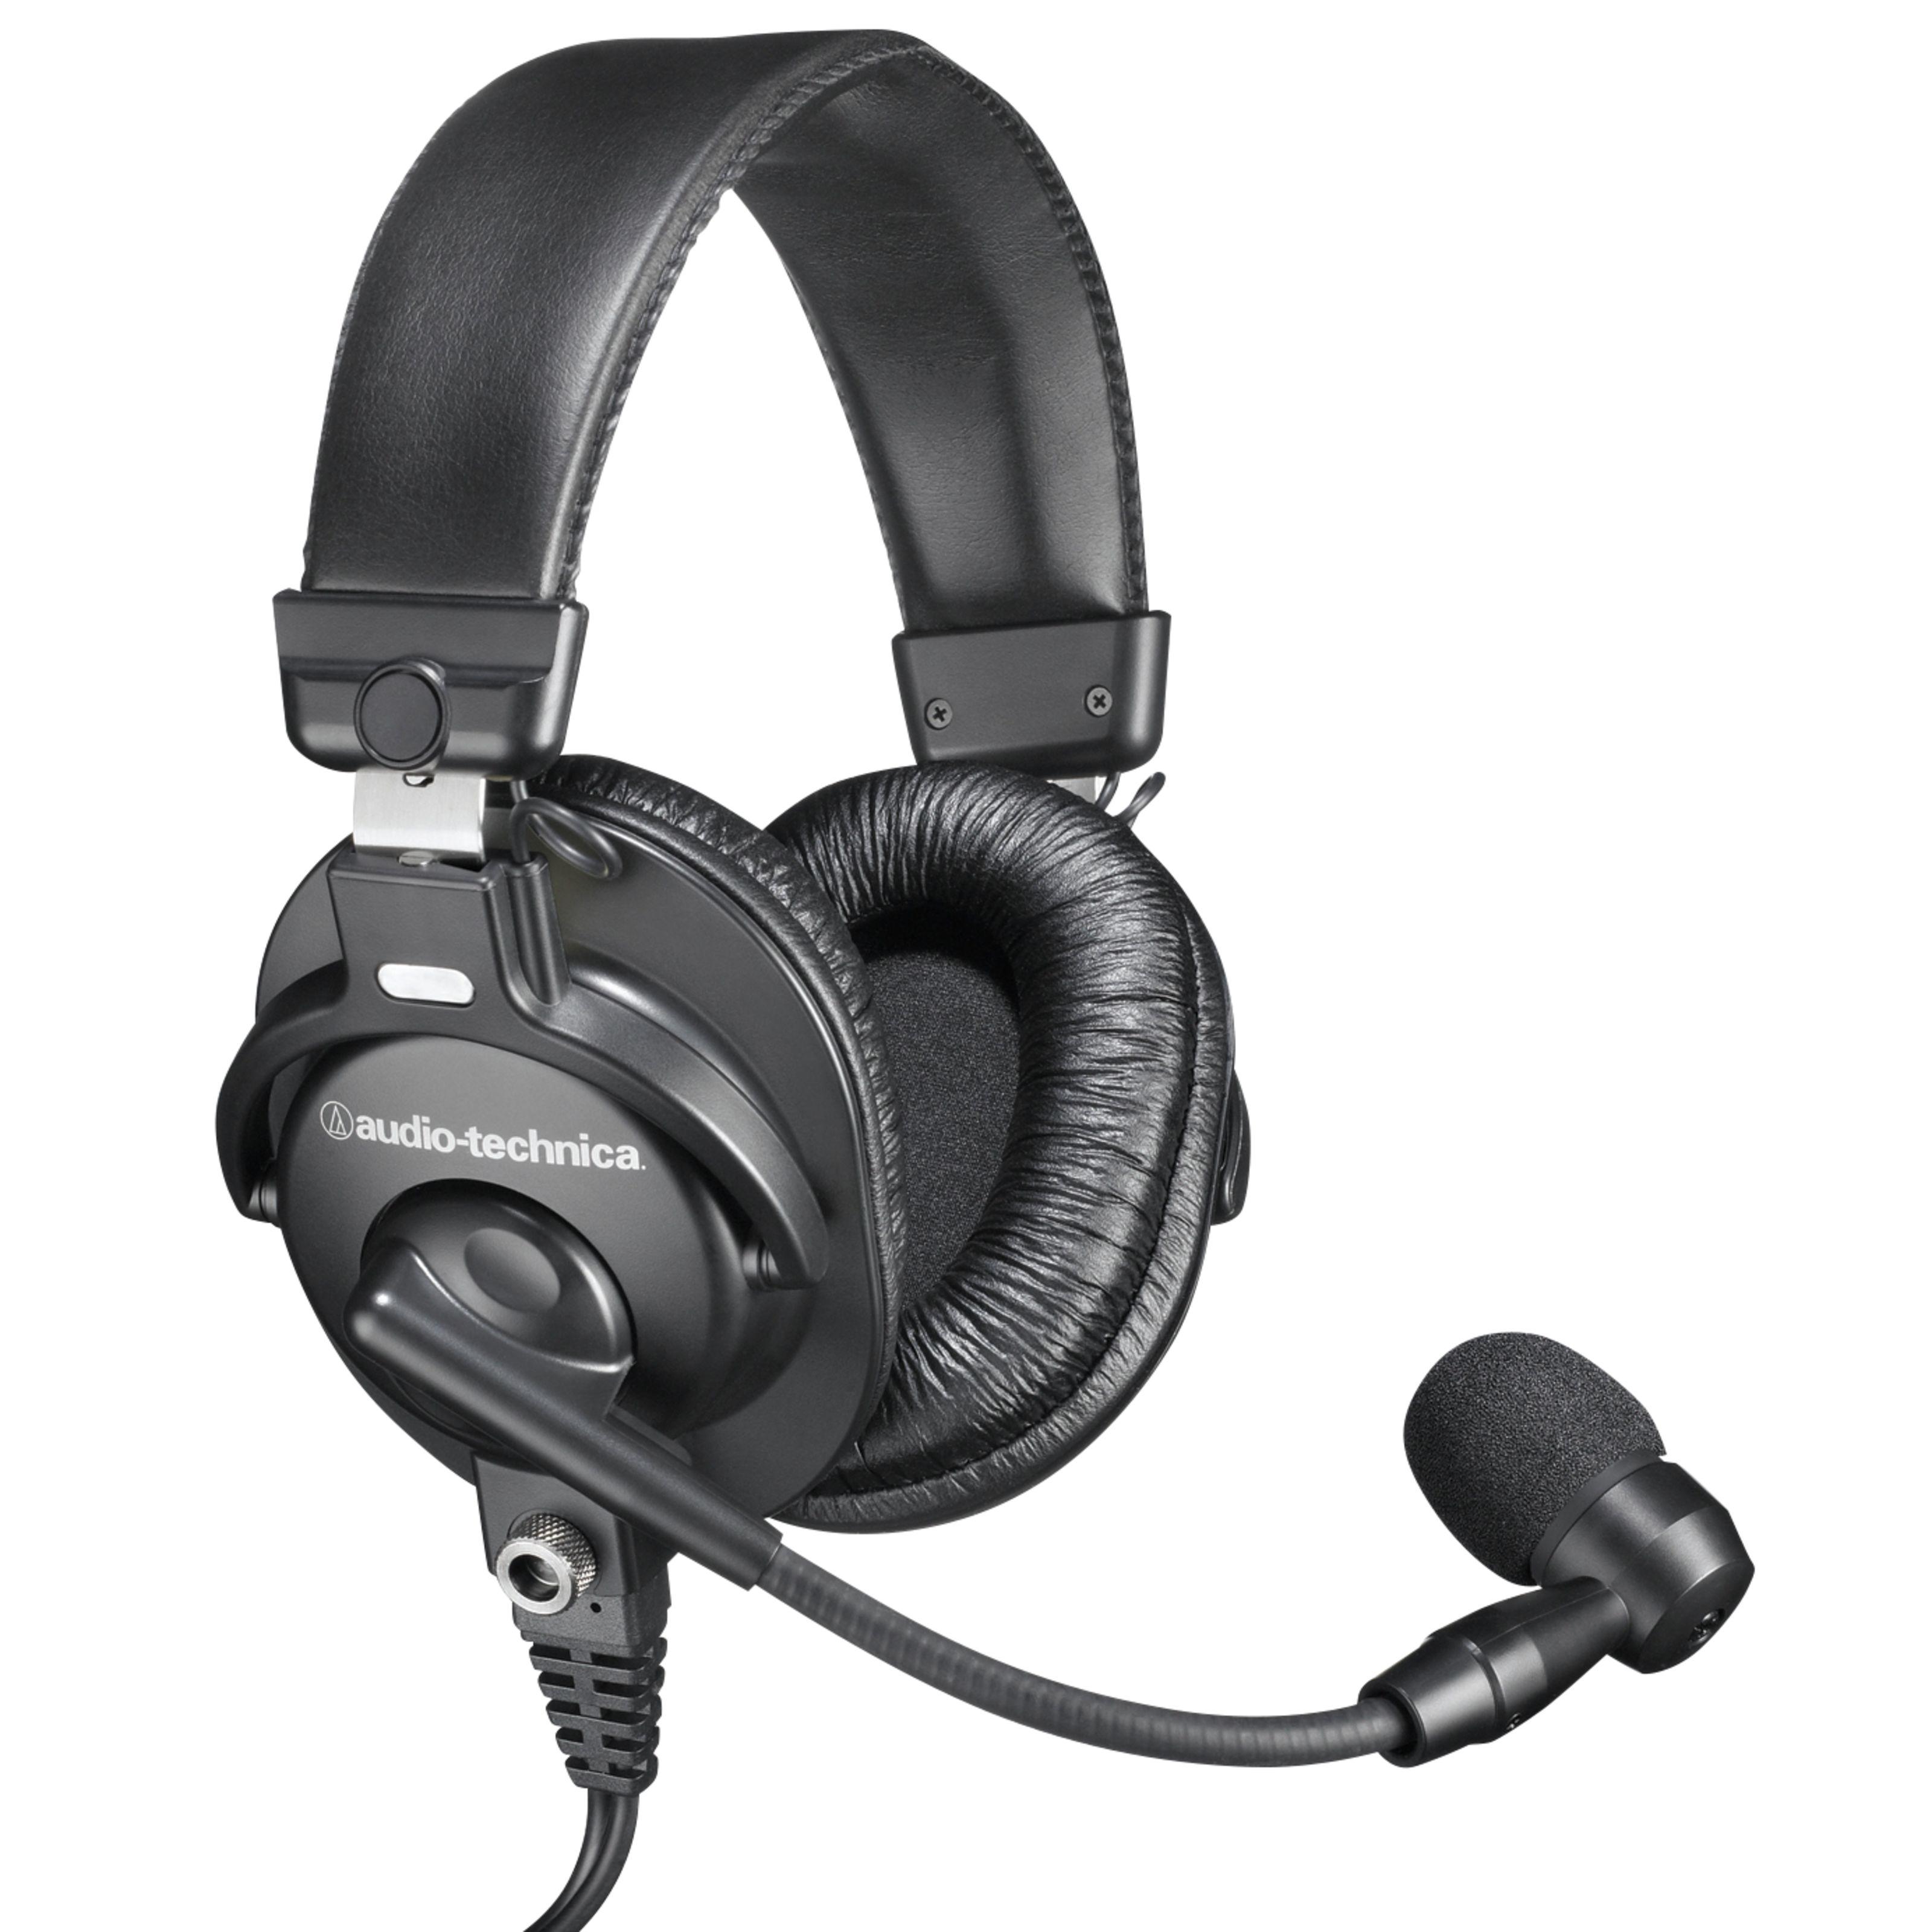 Audio-Technica - BPHS 1 Hör- Sprechgarnitur